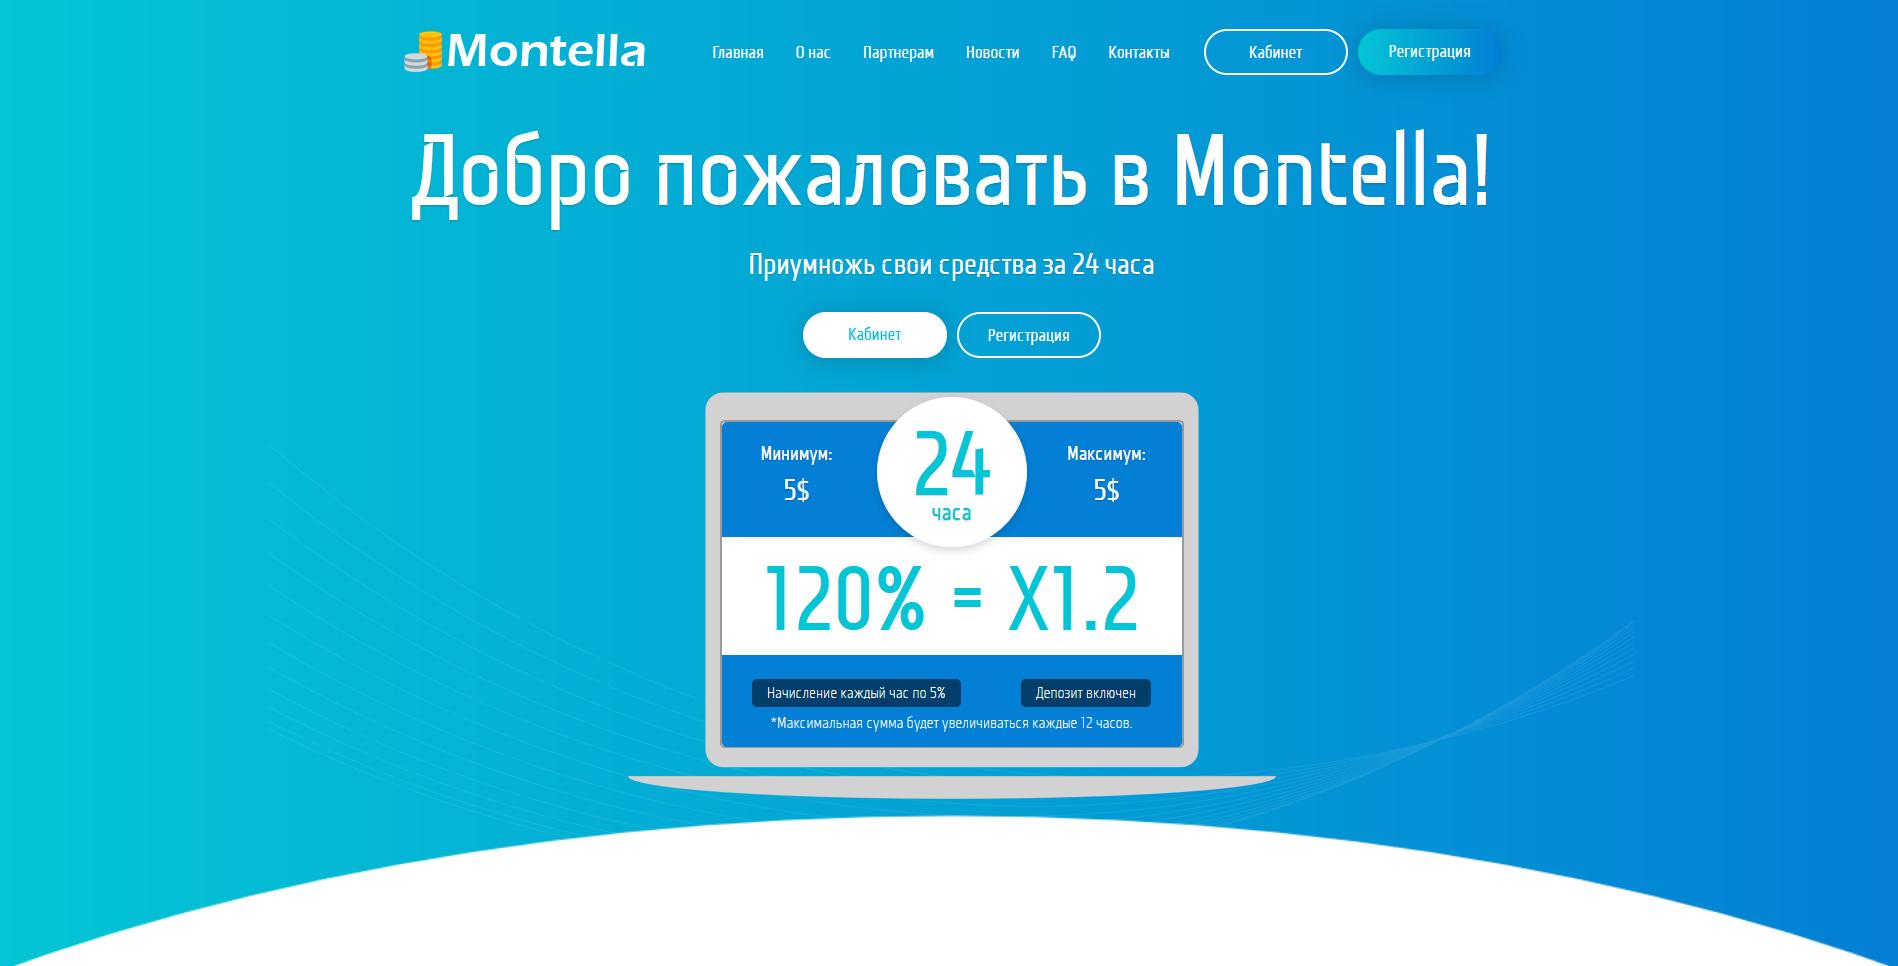 montella - montella.cc